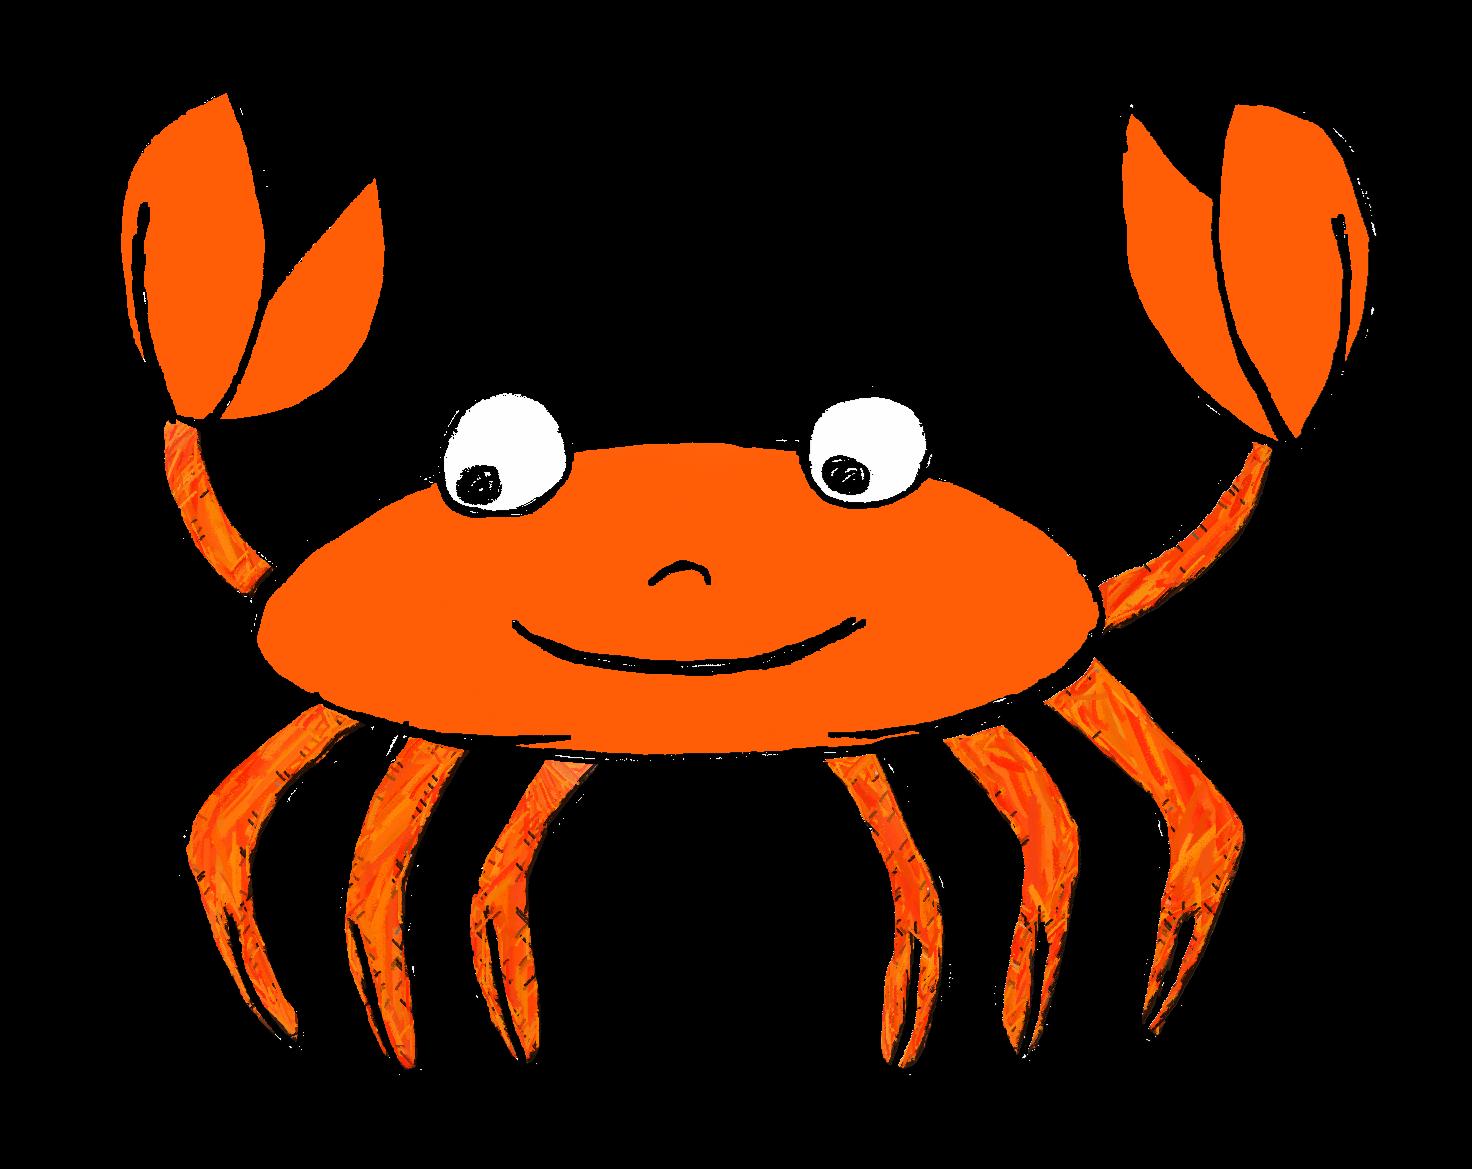 Carrie clipart banner download Clip art by carrie teaching first: ocean doodles clip art ... banner download